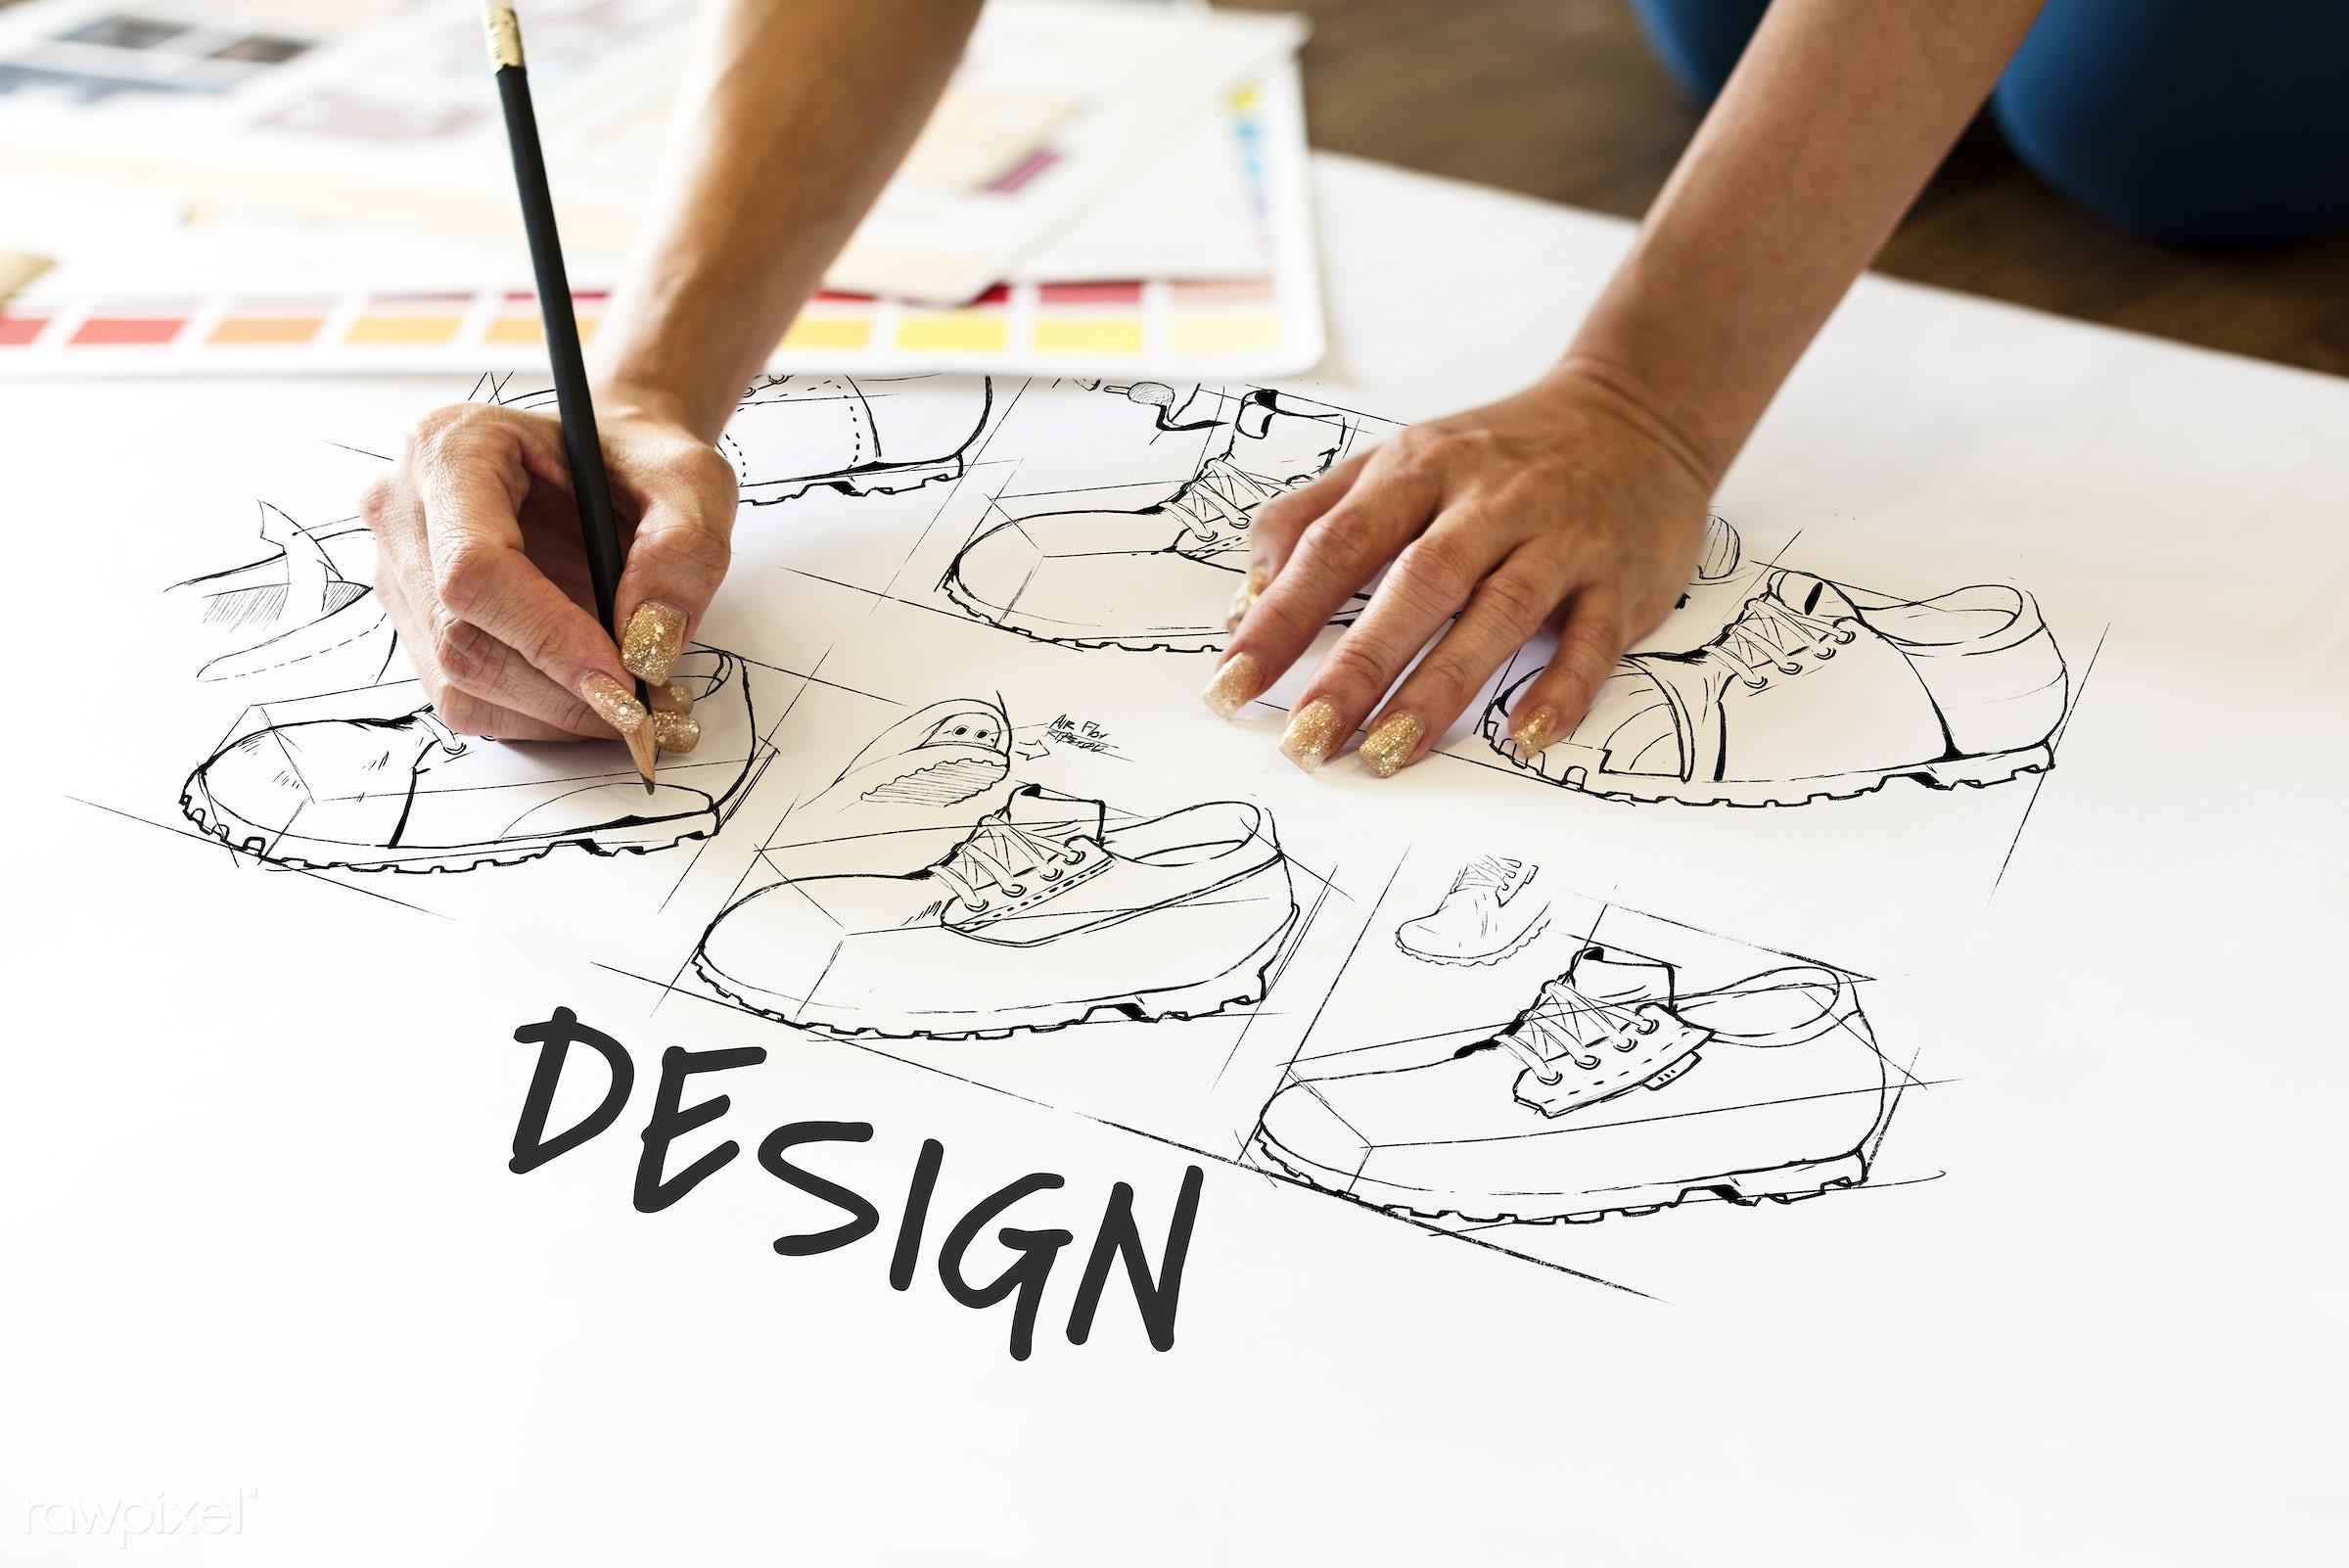 art, artistry, assemble, creation, creative, creativity, design, developments, draft, drawing, fashion, footwear, hands,...